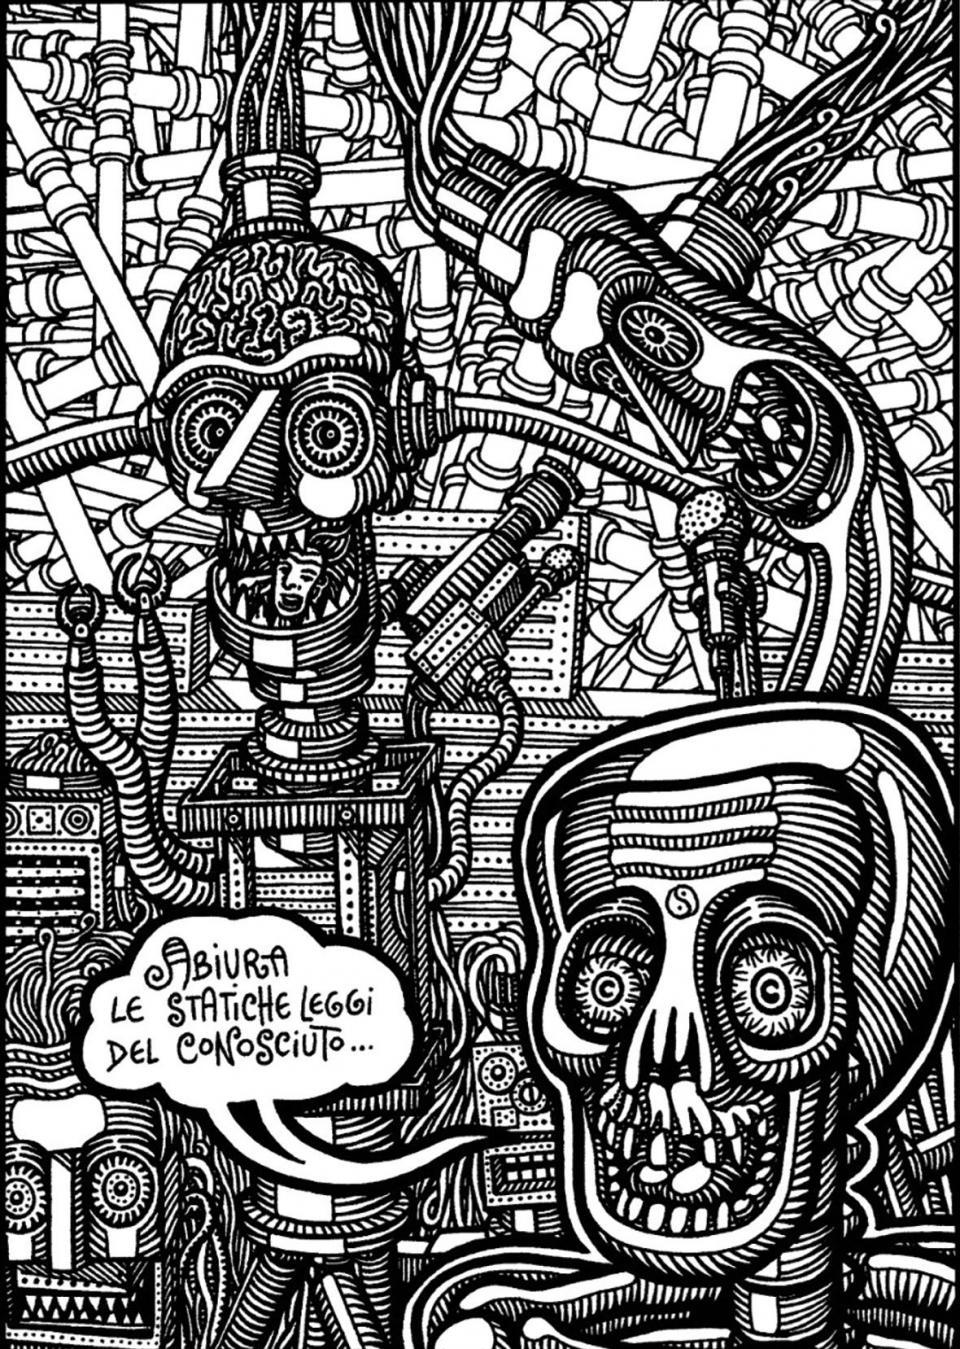 An illustration by Gianluca Lerici, aka Prof. Bad Trip.